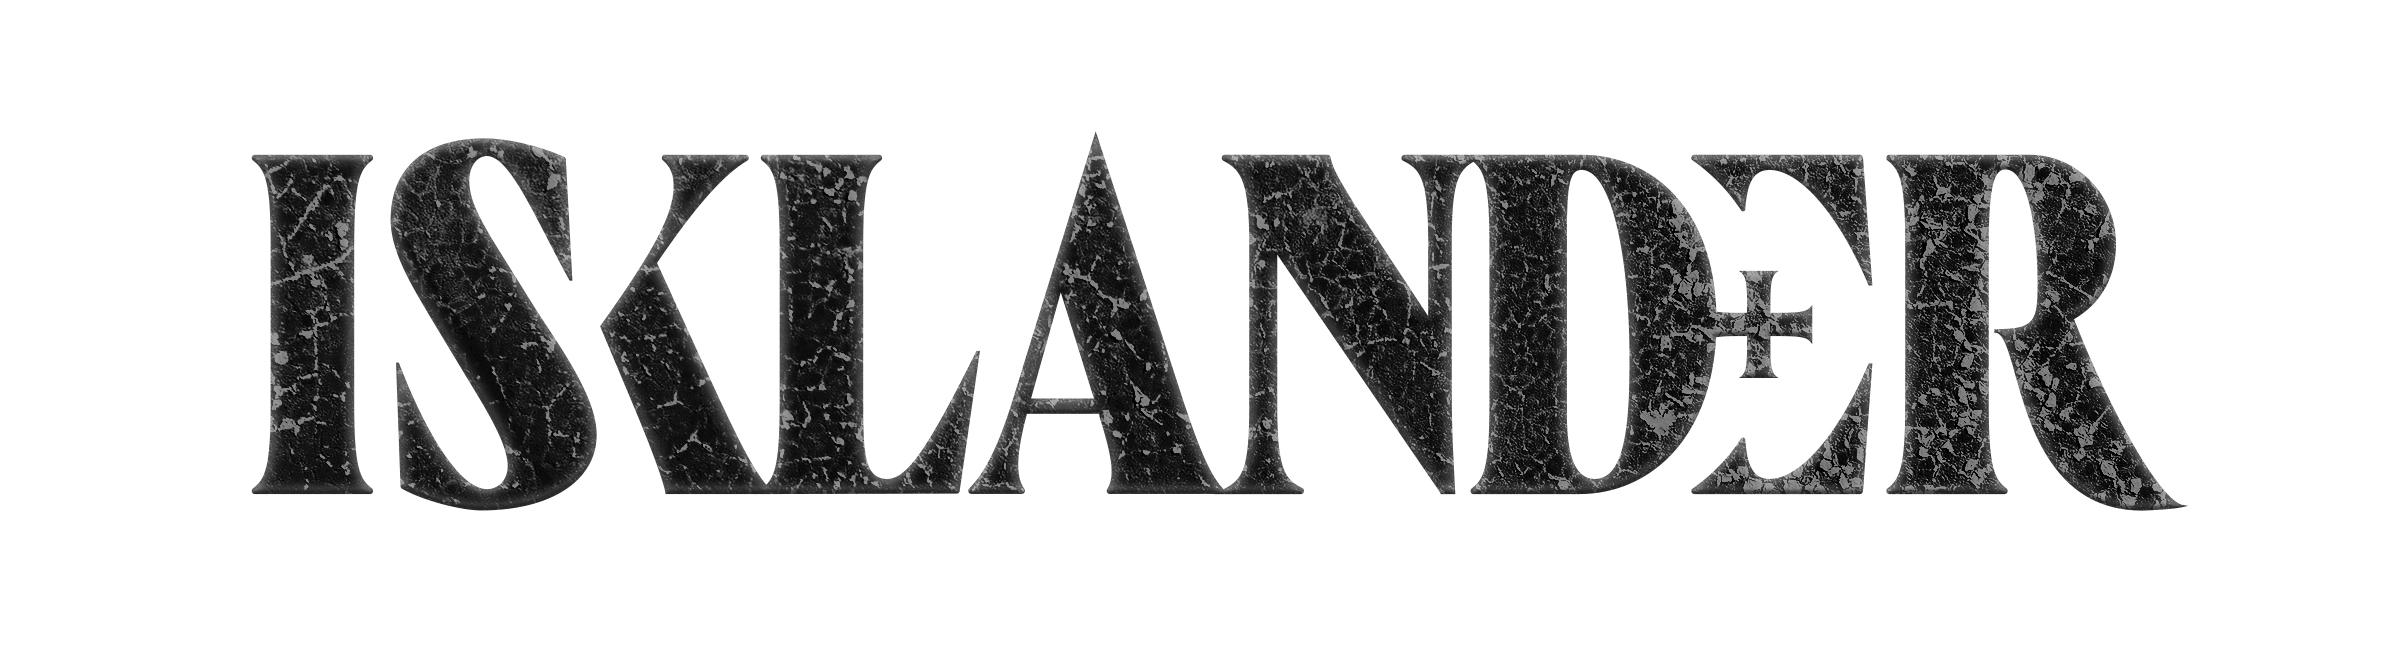 Isklander-Logo-texture-POS